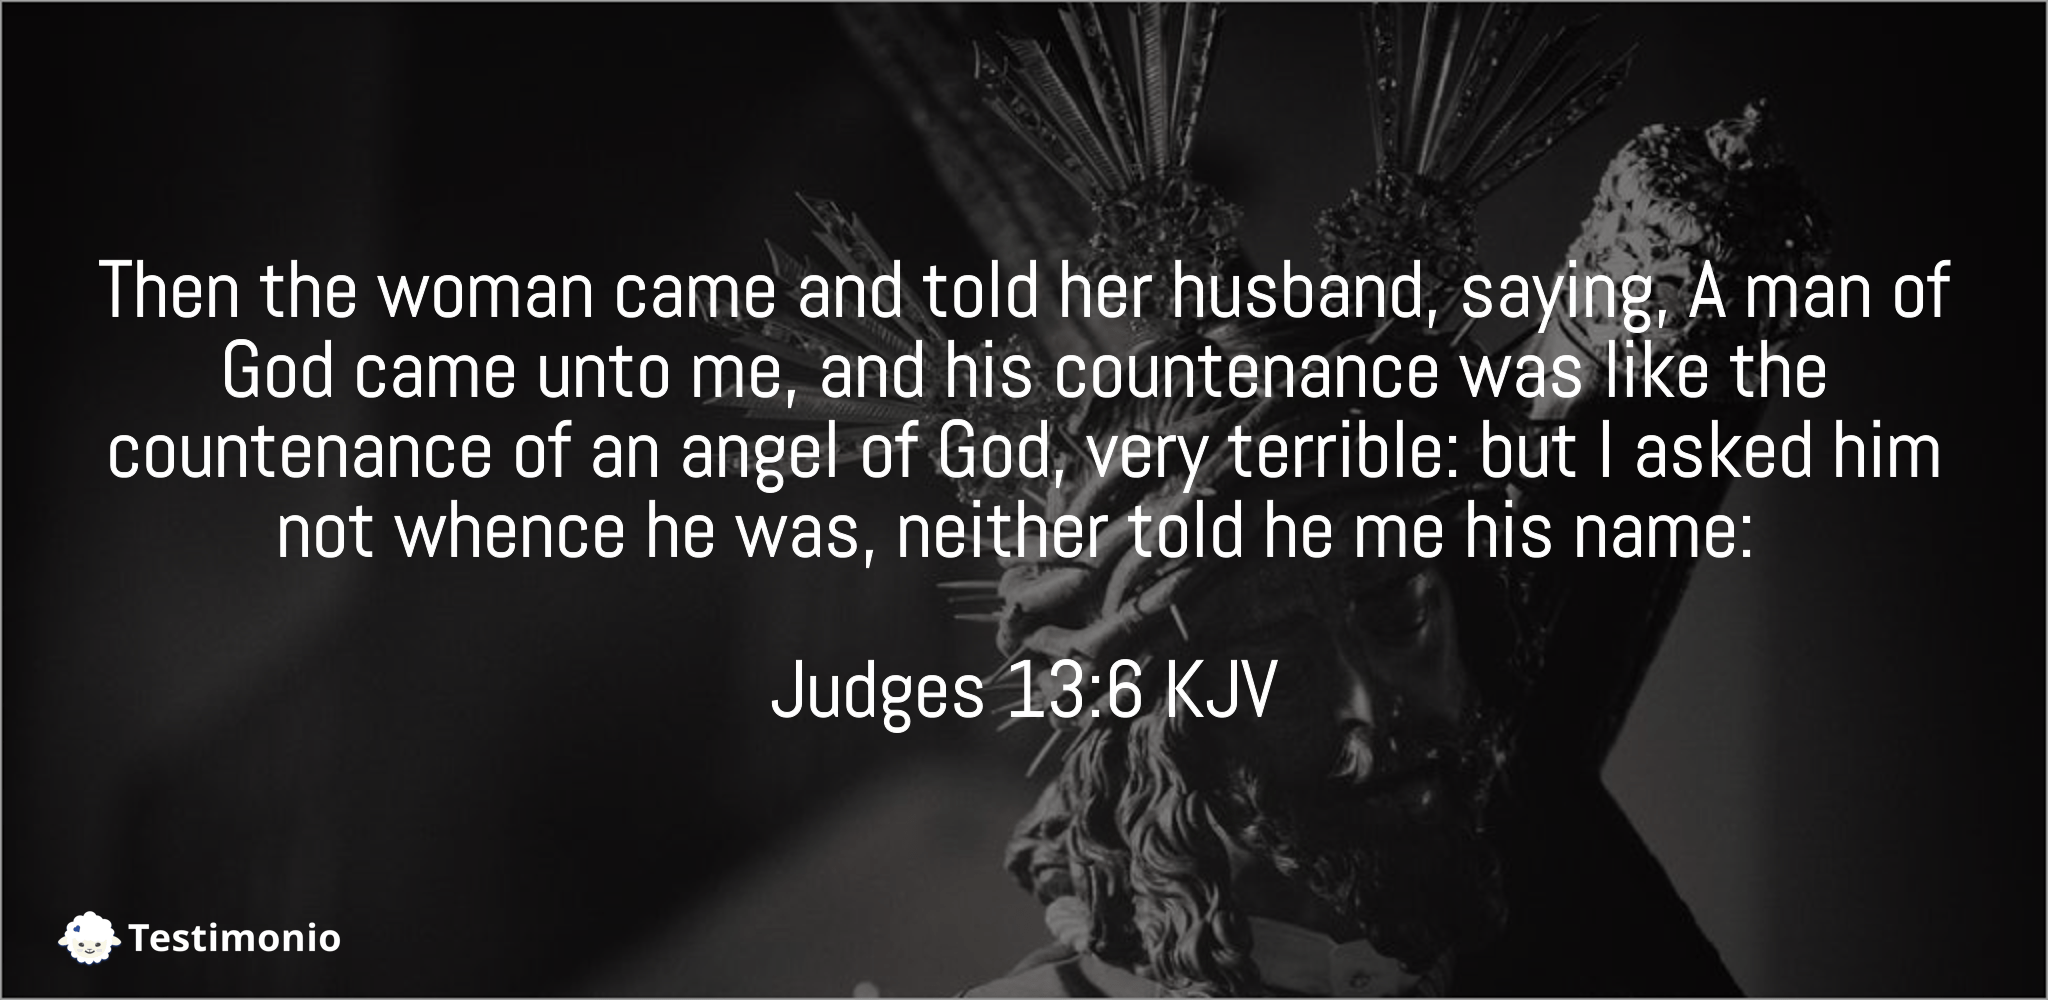 Judges 13:6